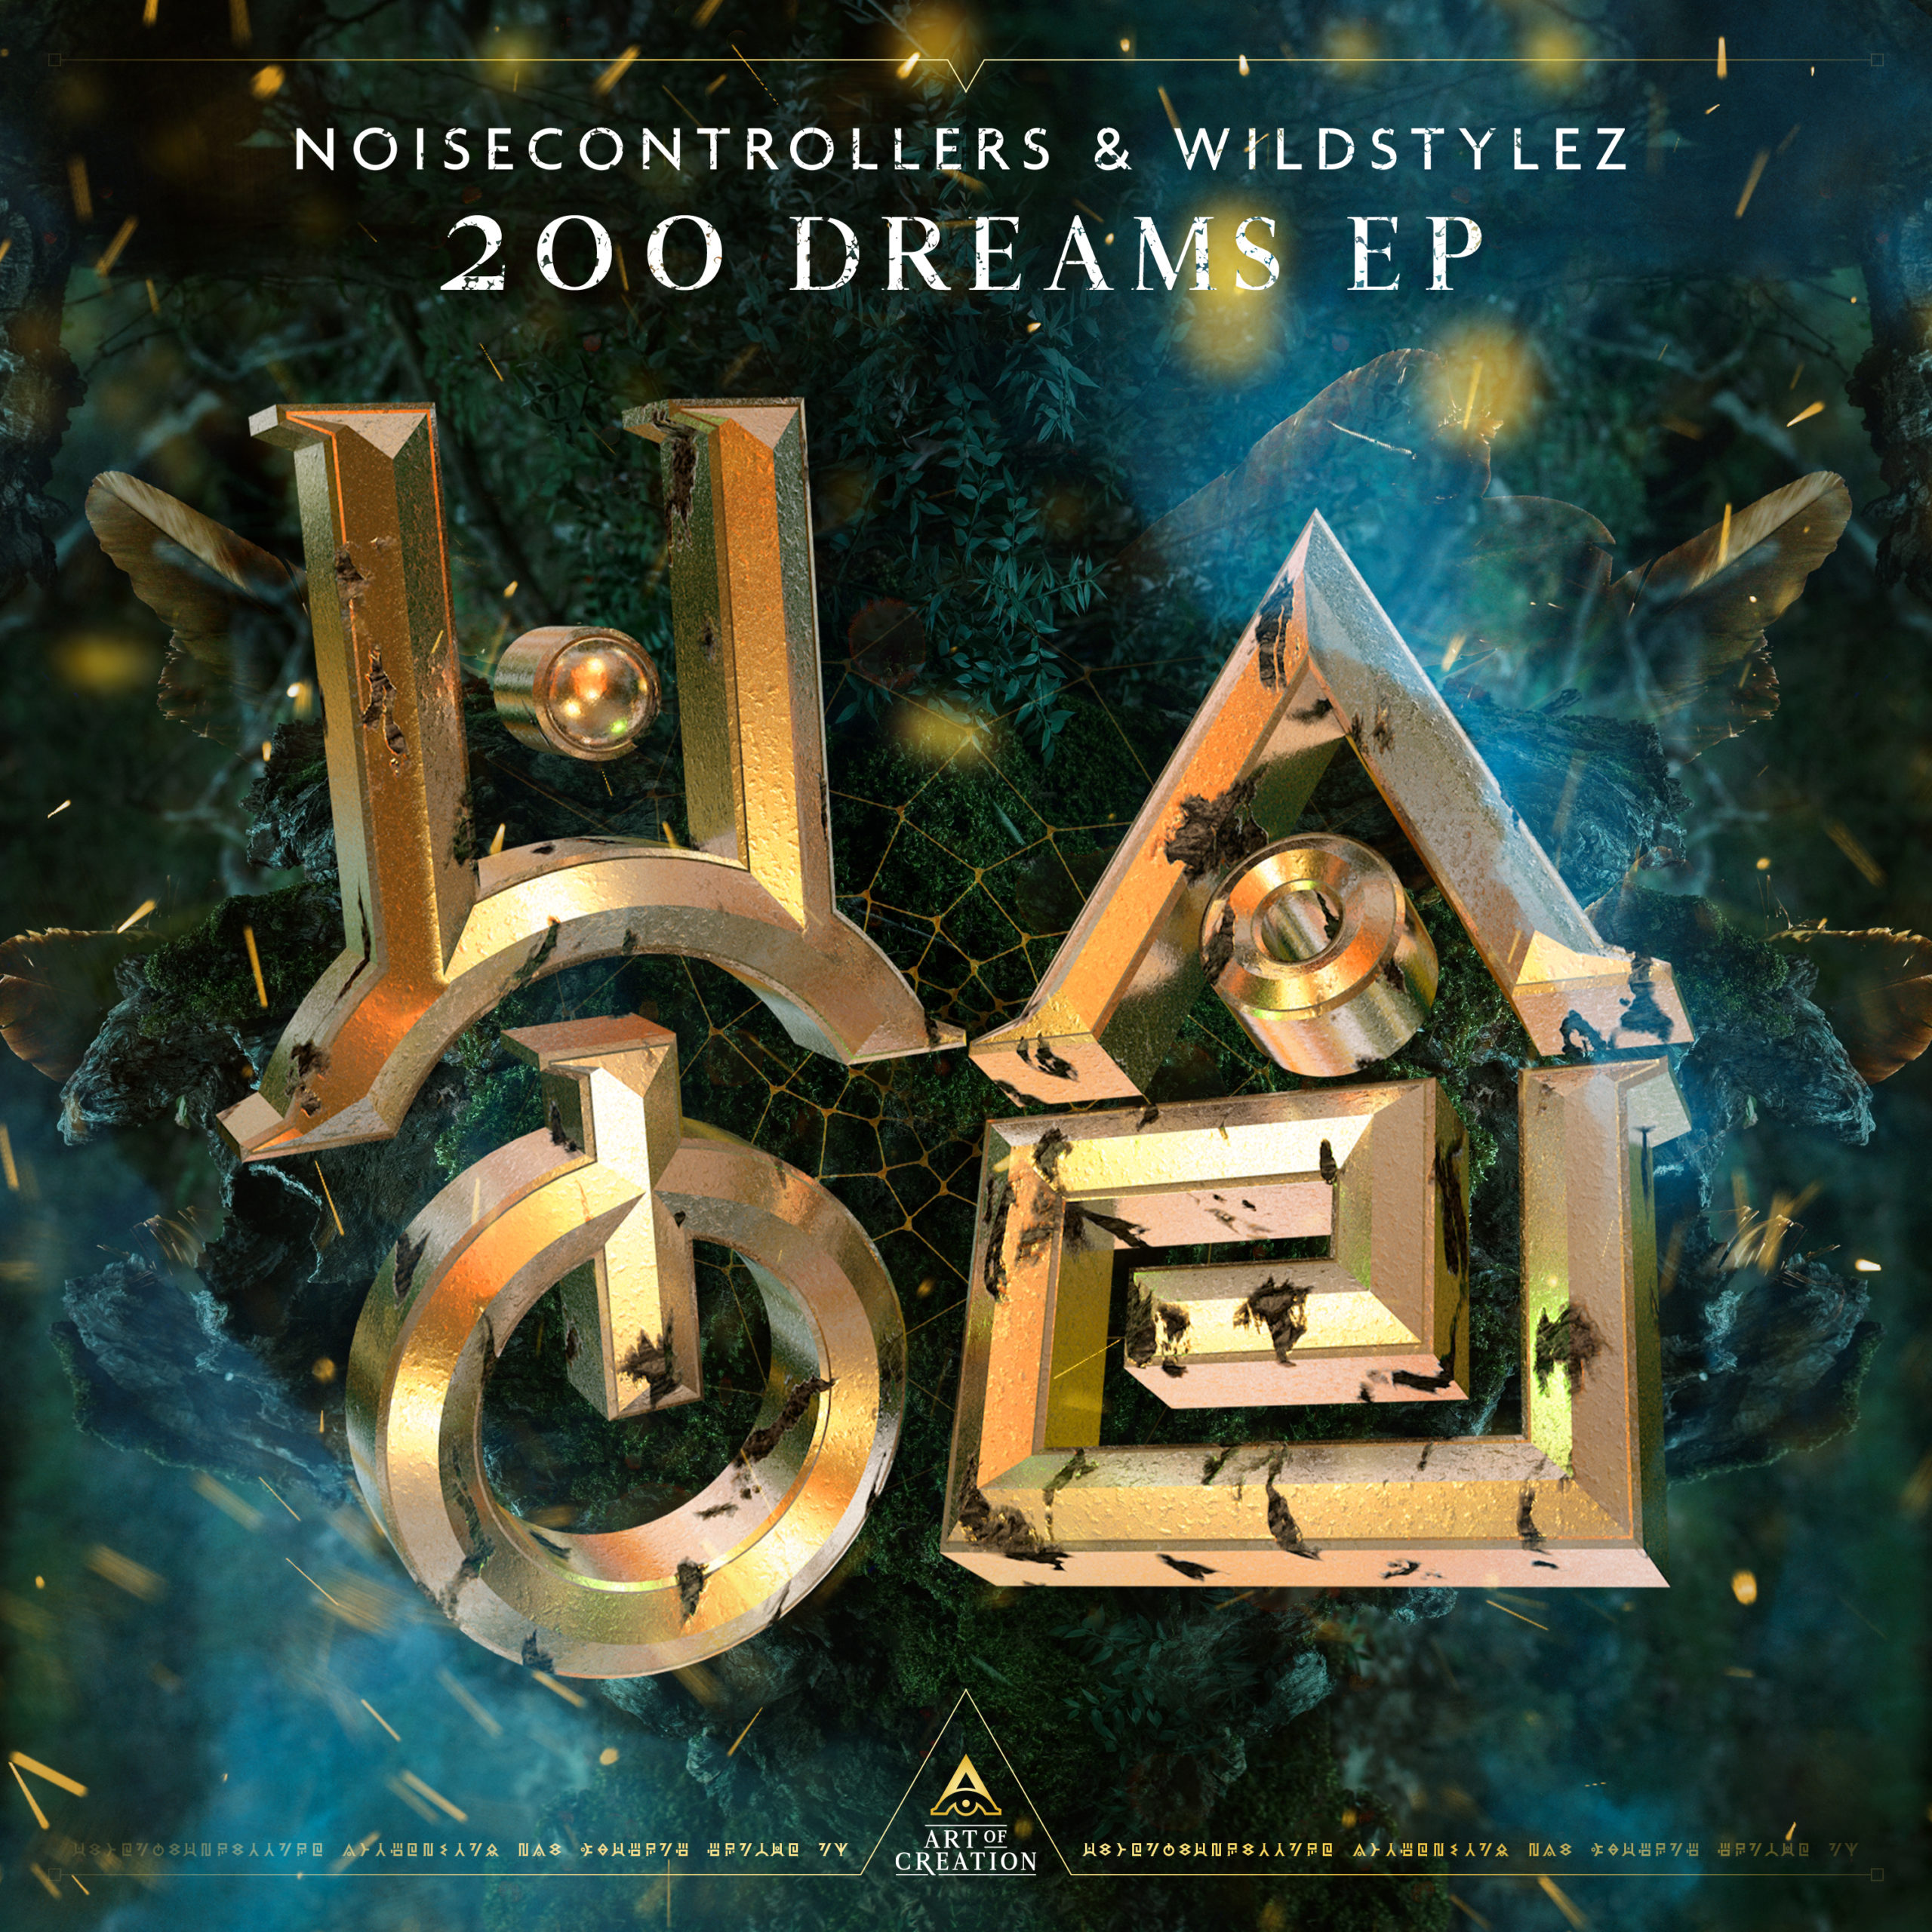 Noisecontrollers & Wildstylez - 200 Dreams